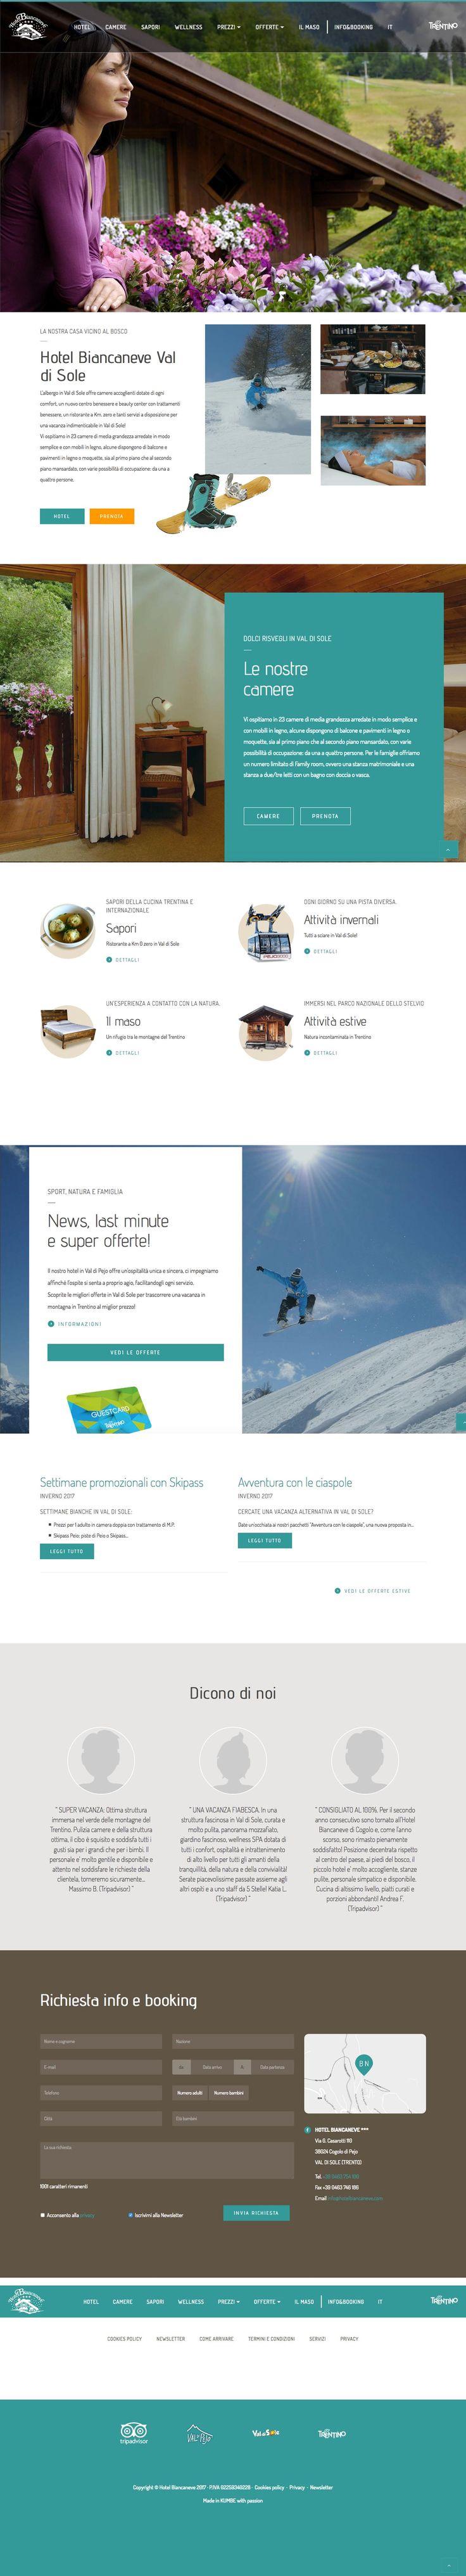 #hotelbiancaneve www.hotelbiancaneve.com #Kumbe #portfolioweb #webdesign #website #responsivedesign #responsive #cogolo #valdipajo #valdisole #trentino #hotel #holiday #love #family #ciaspole #ski #snow #trekking #skipass #sapori #tradizione #maso